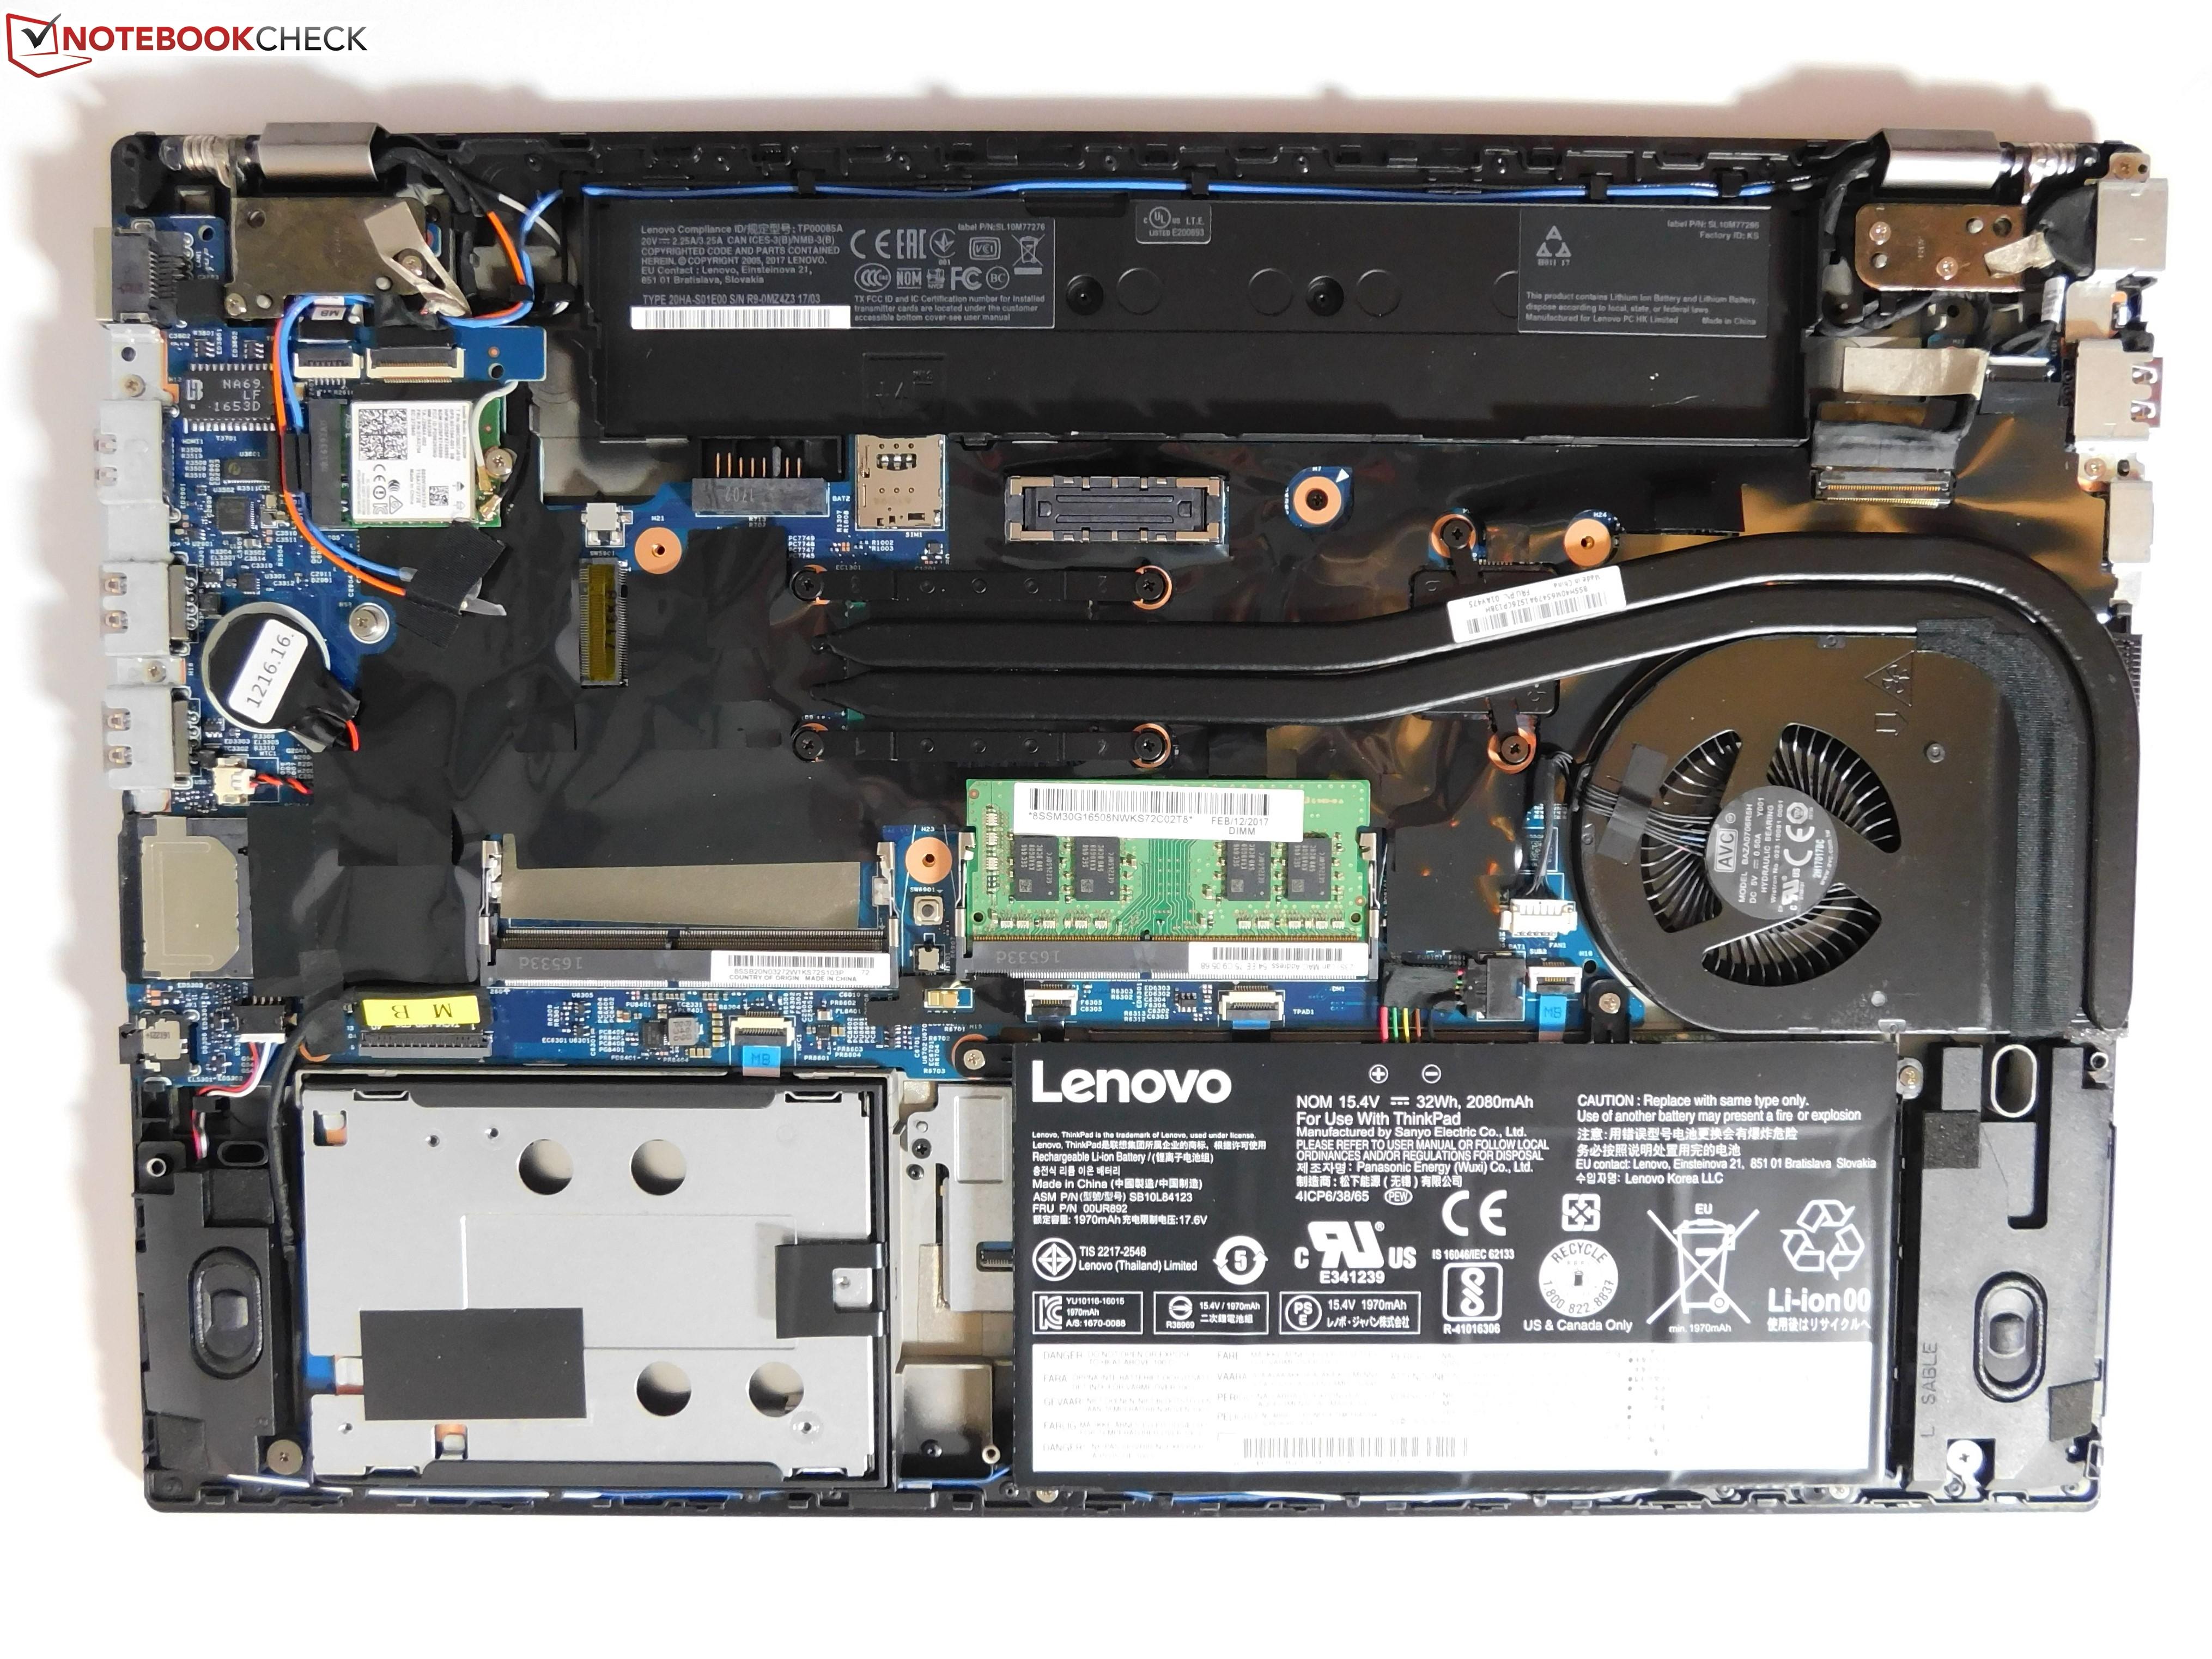 Lenovo ThinkPad T570 (Core i7, 4K, 940MX) Laptop Review